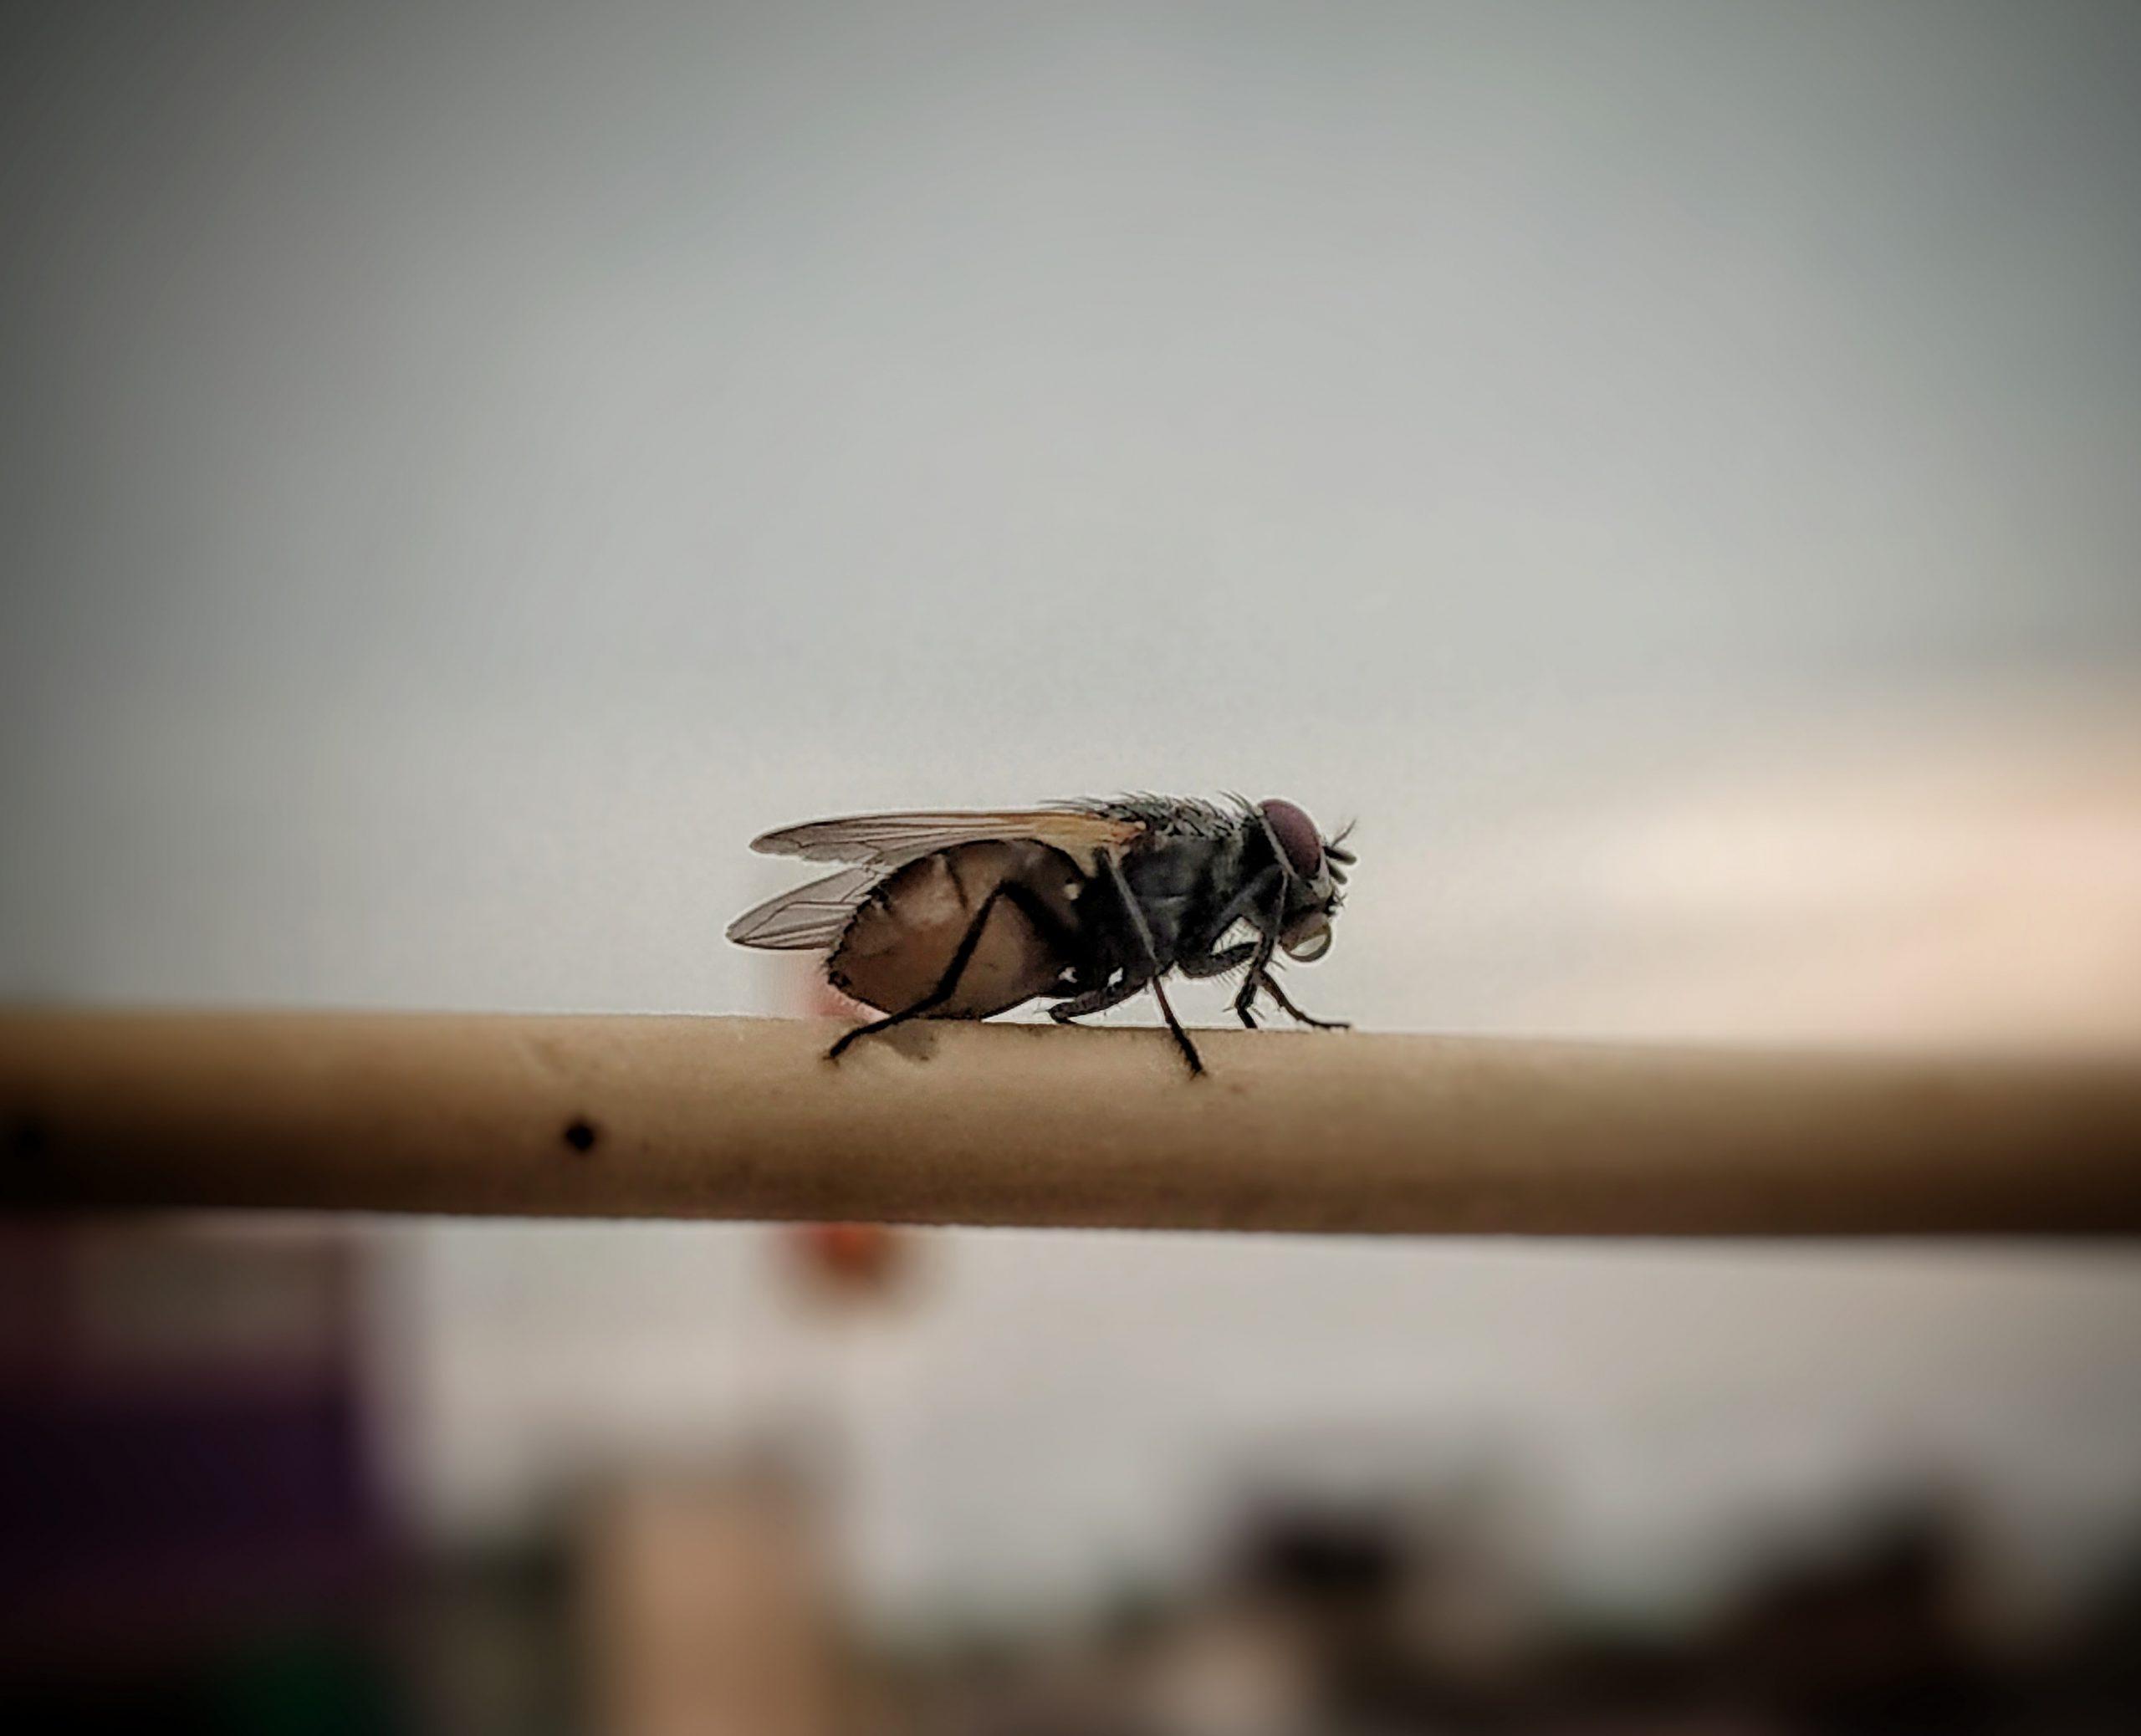 A housefly sitting on railing